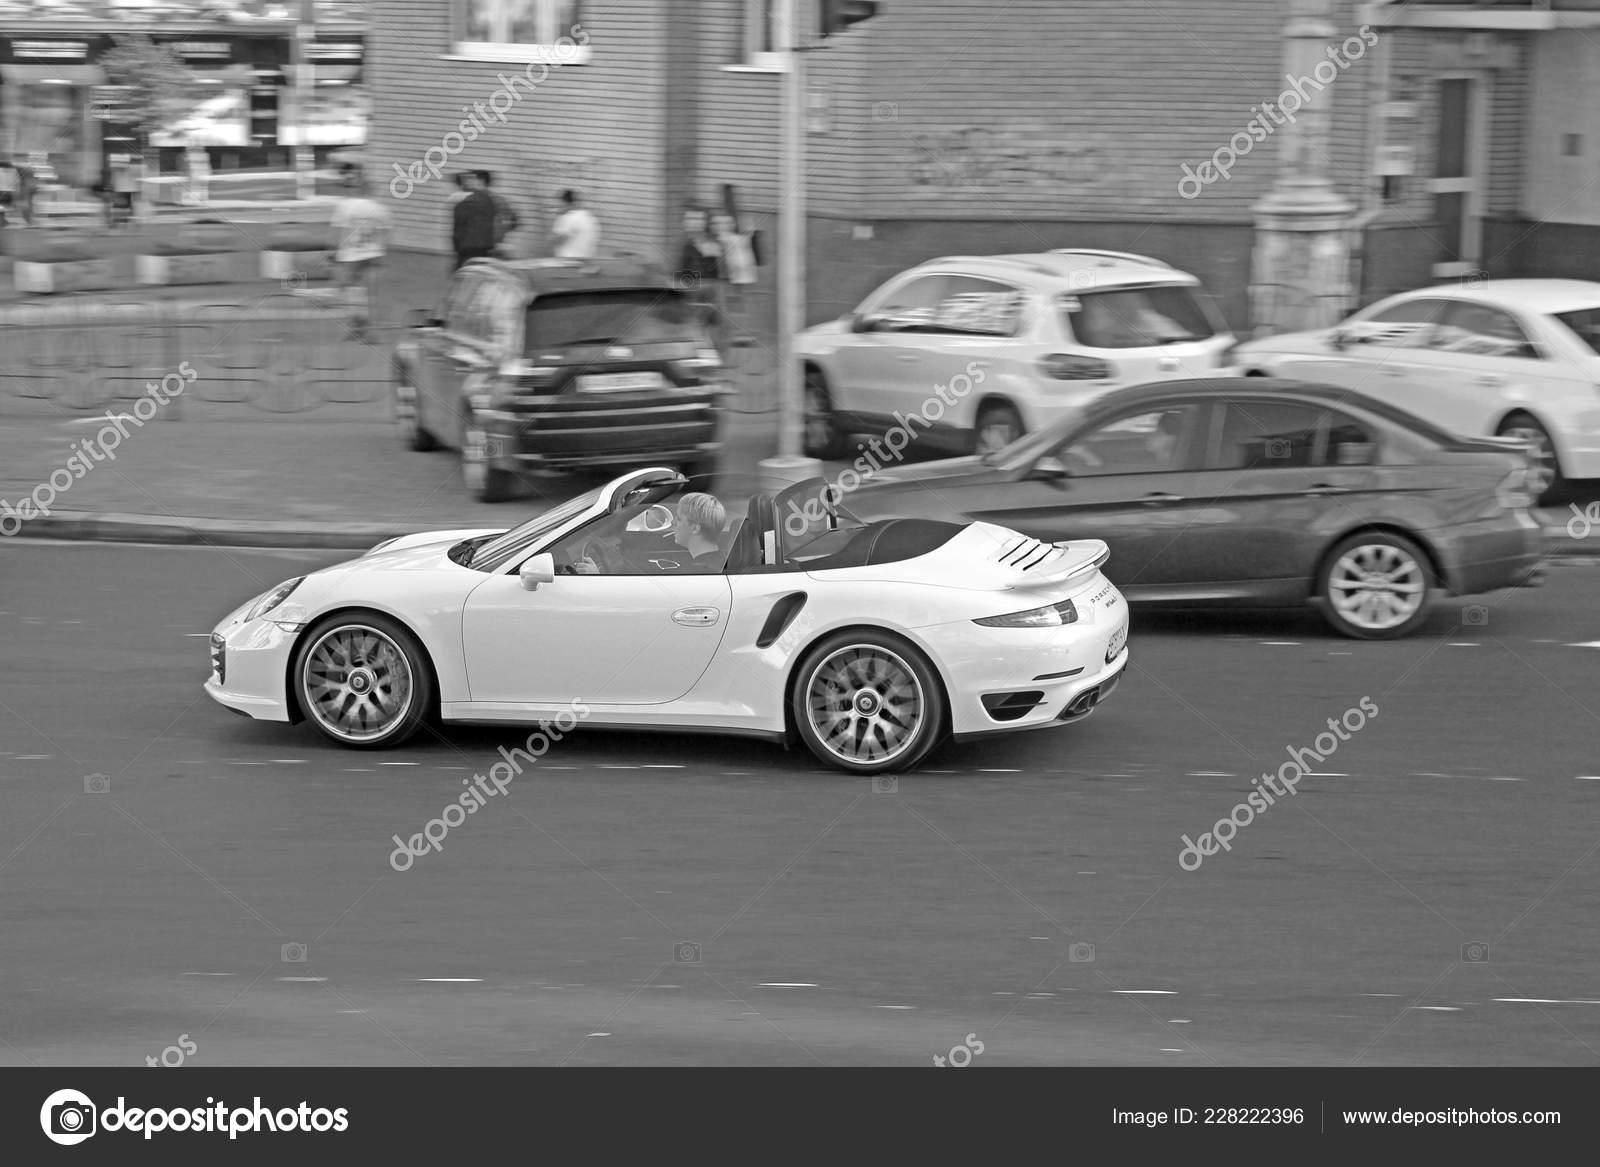 Odessa Ukraine September 2017 White Convertible Motion Porsche 911 Turbo Stock Editorial Photo C Amor7 228222396